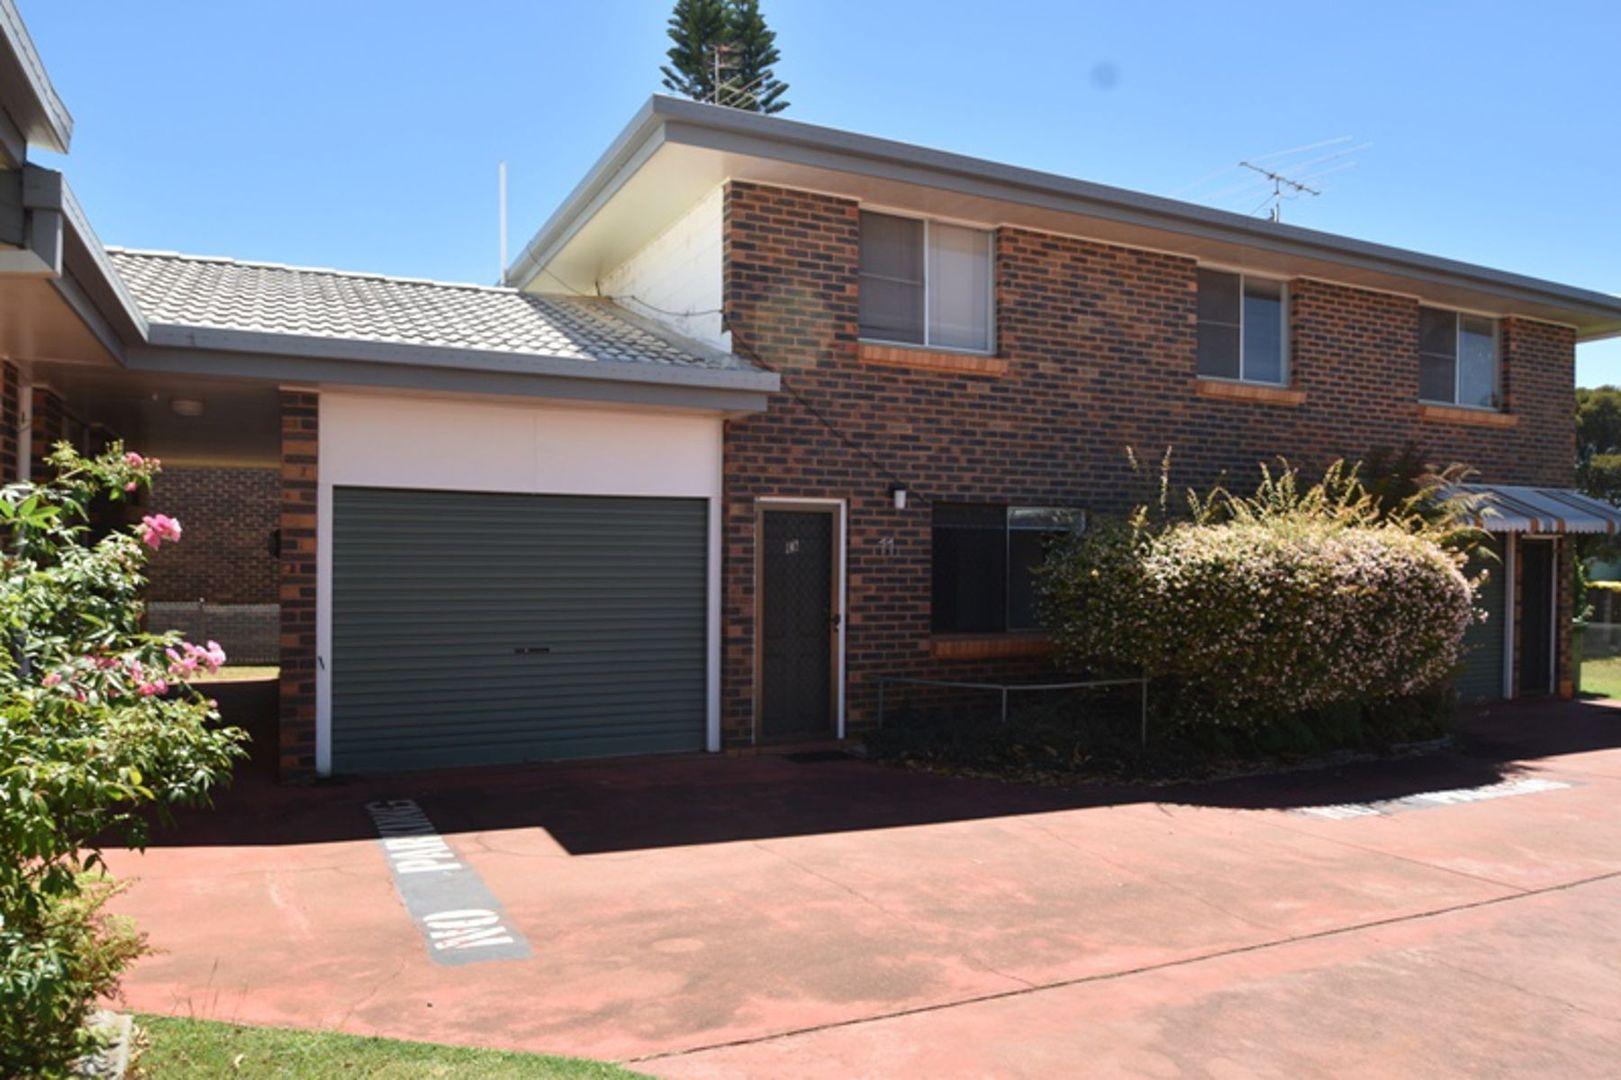 11/335 West Street, Harristown QLD 4350, Image 0